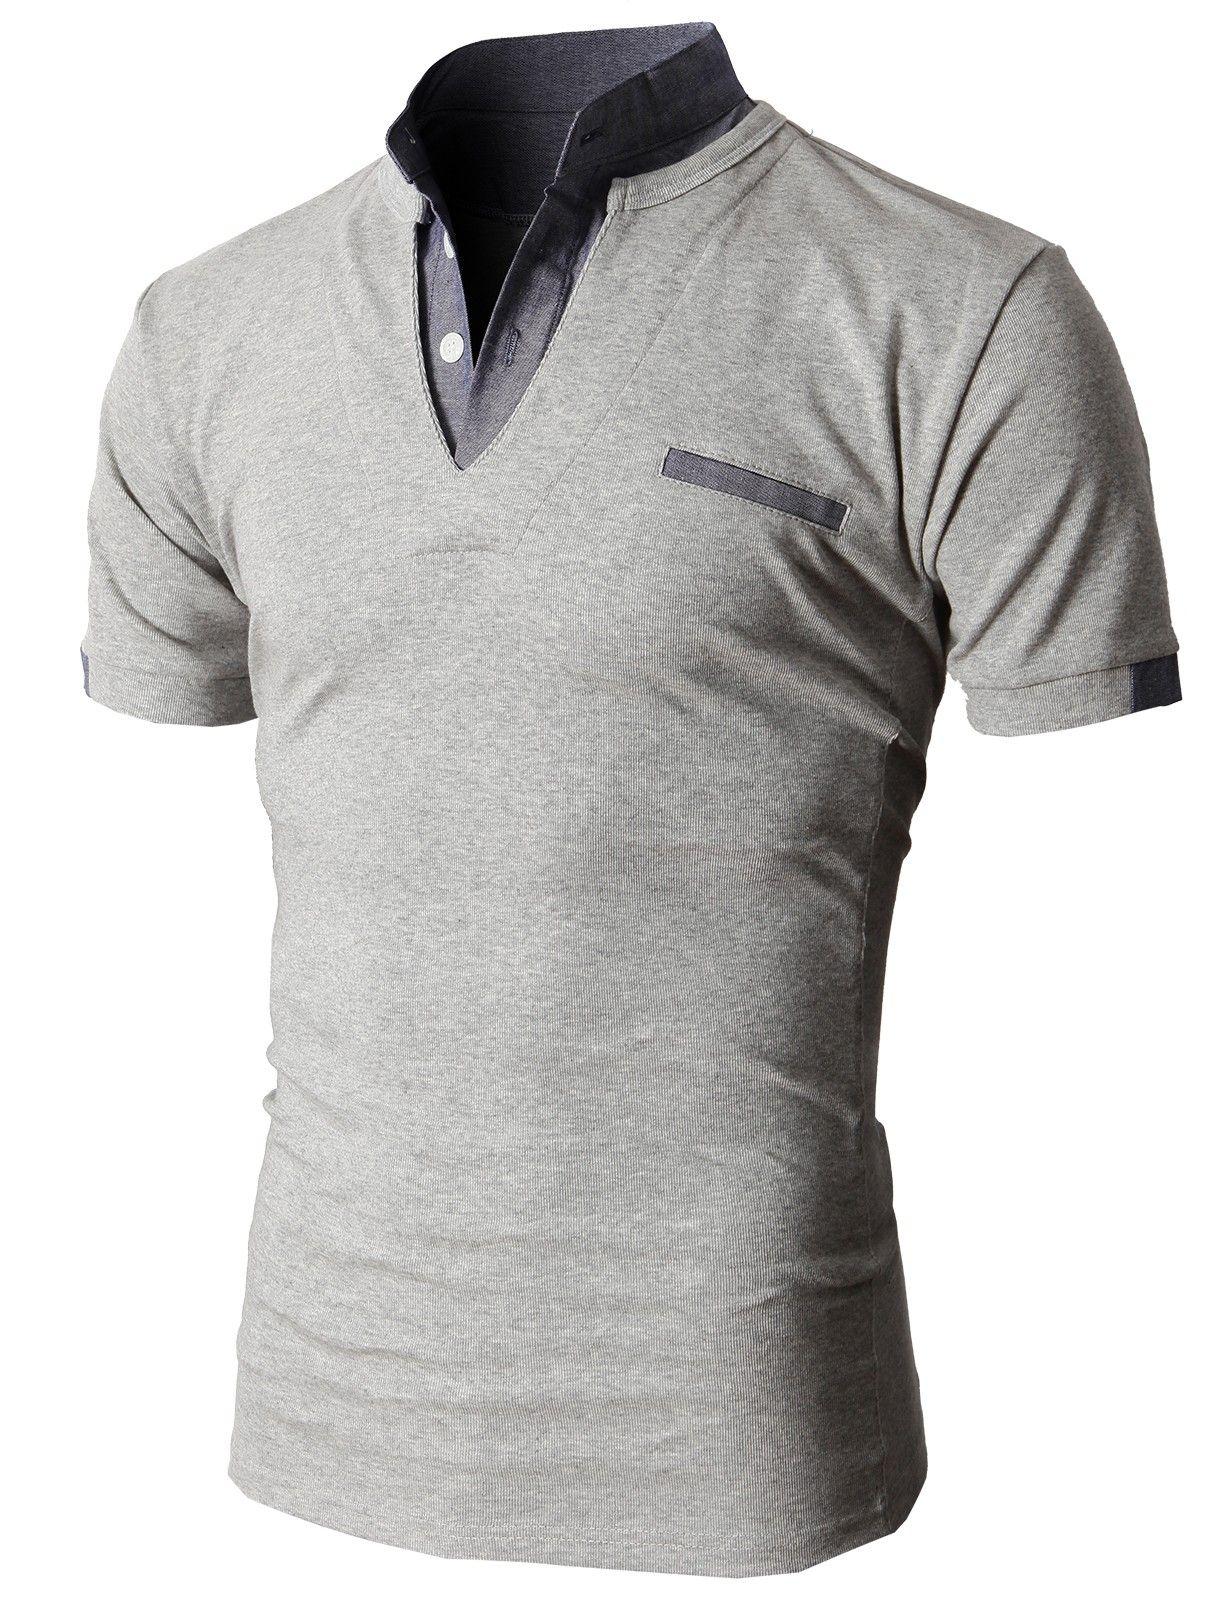 Doublju Men s Unique Hybrid Fashion Polo Shirts with Short Sleeve  (KMTTS0100)  doublju b691ad41fd7